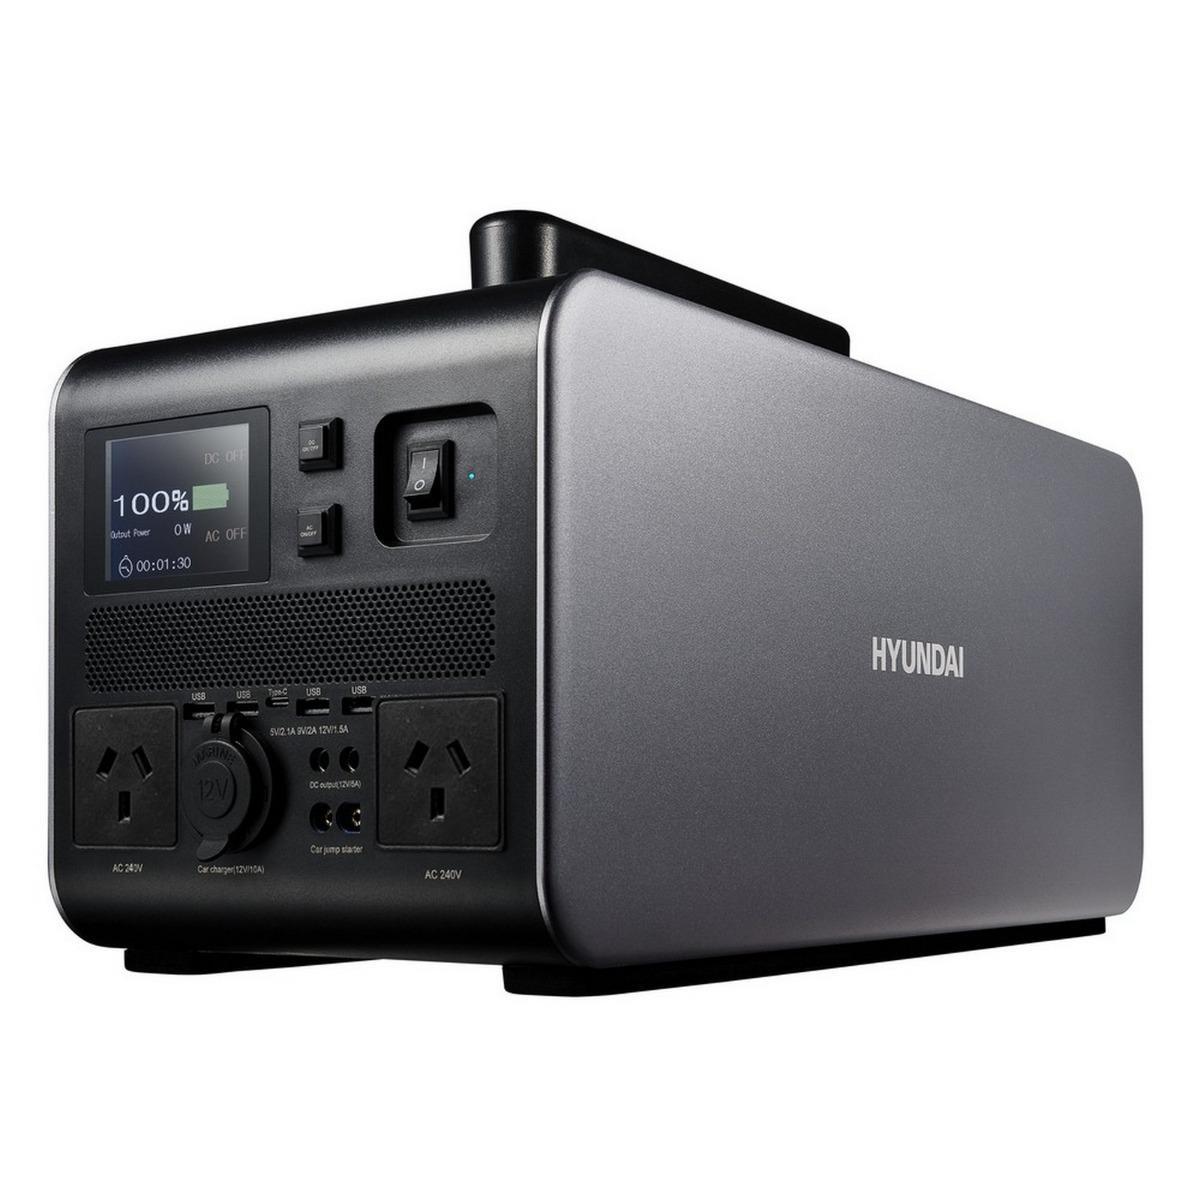 Hyundai 1500W / 3000W max LiFePO4 Lithium Power Station AC/DC - 137Ah Battery